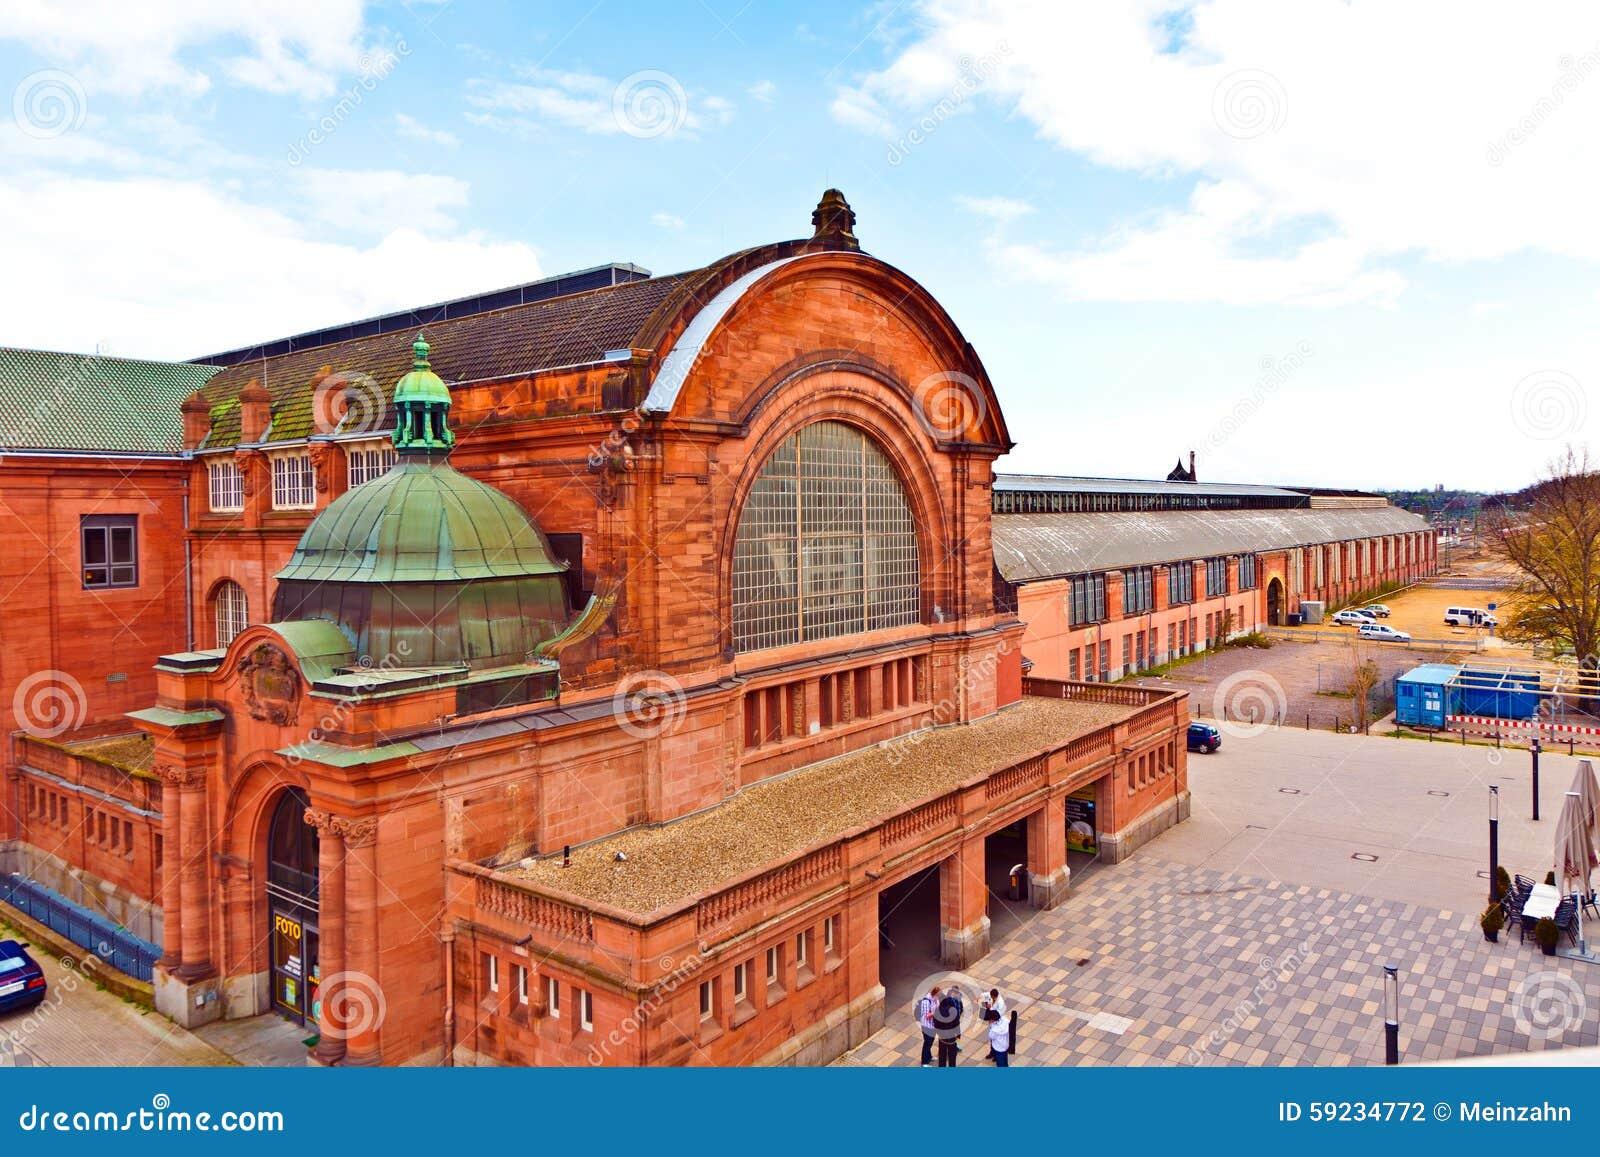 Vieja estación de tren classicistical en Wiesbaden